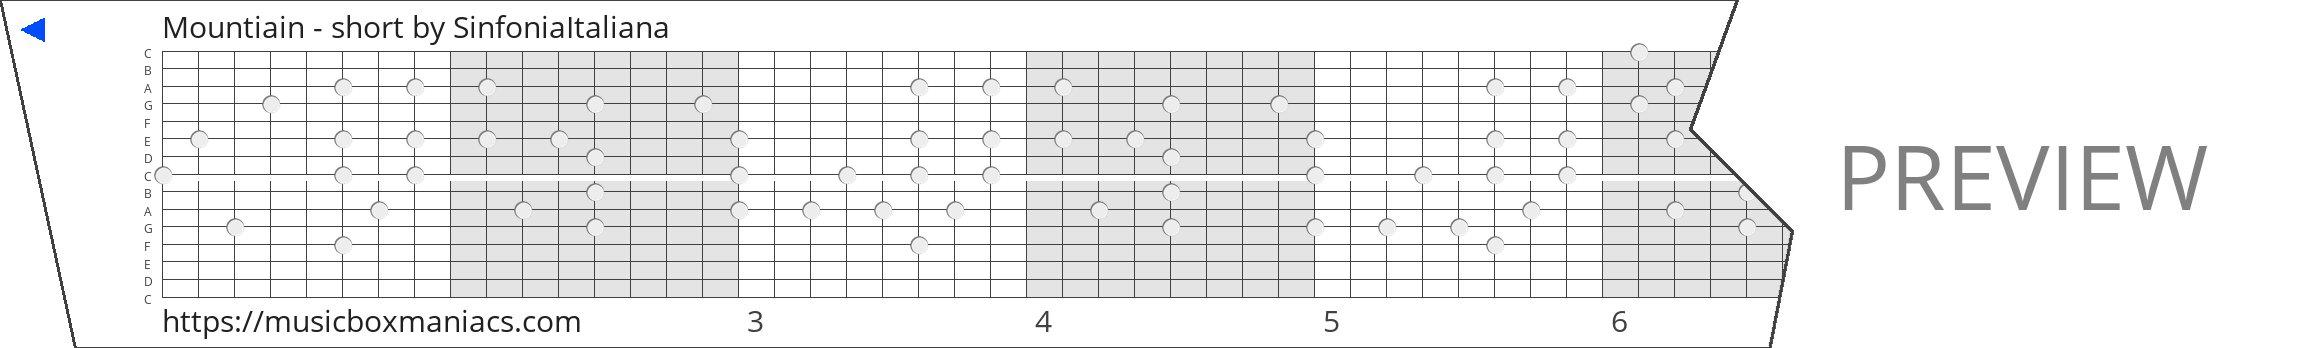 Mountiain - short 15 note music box paper strip